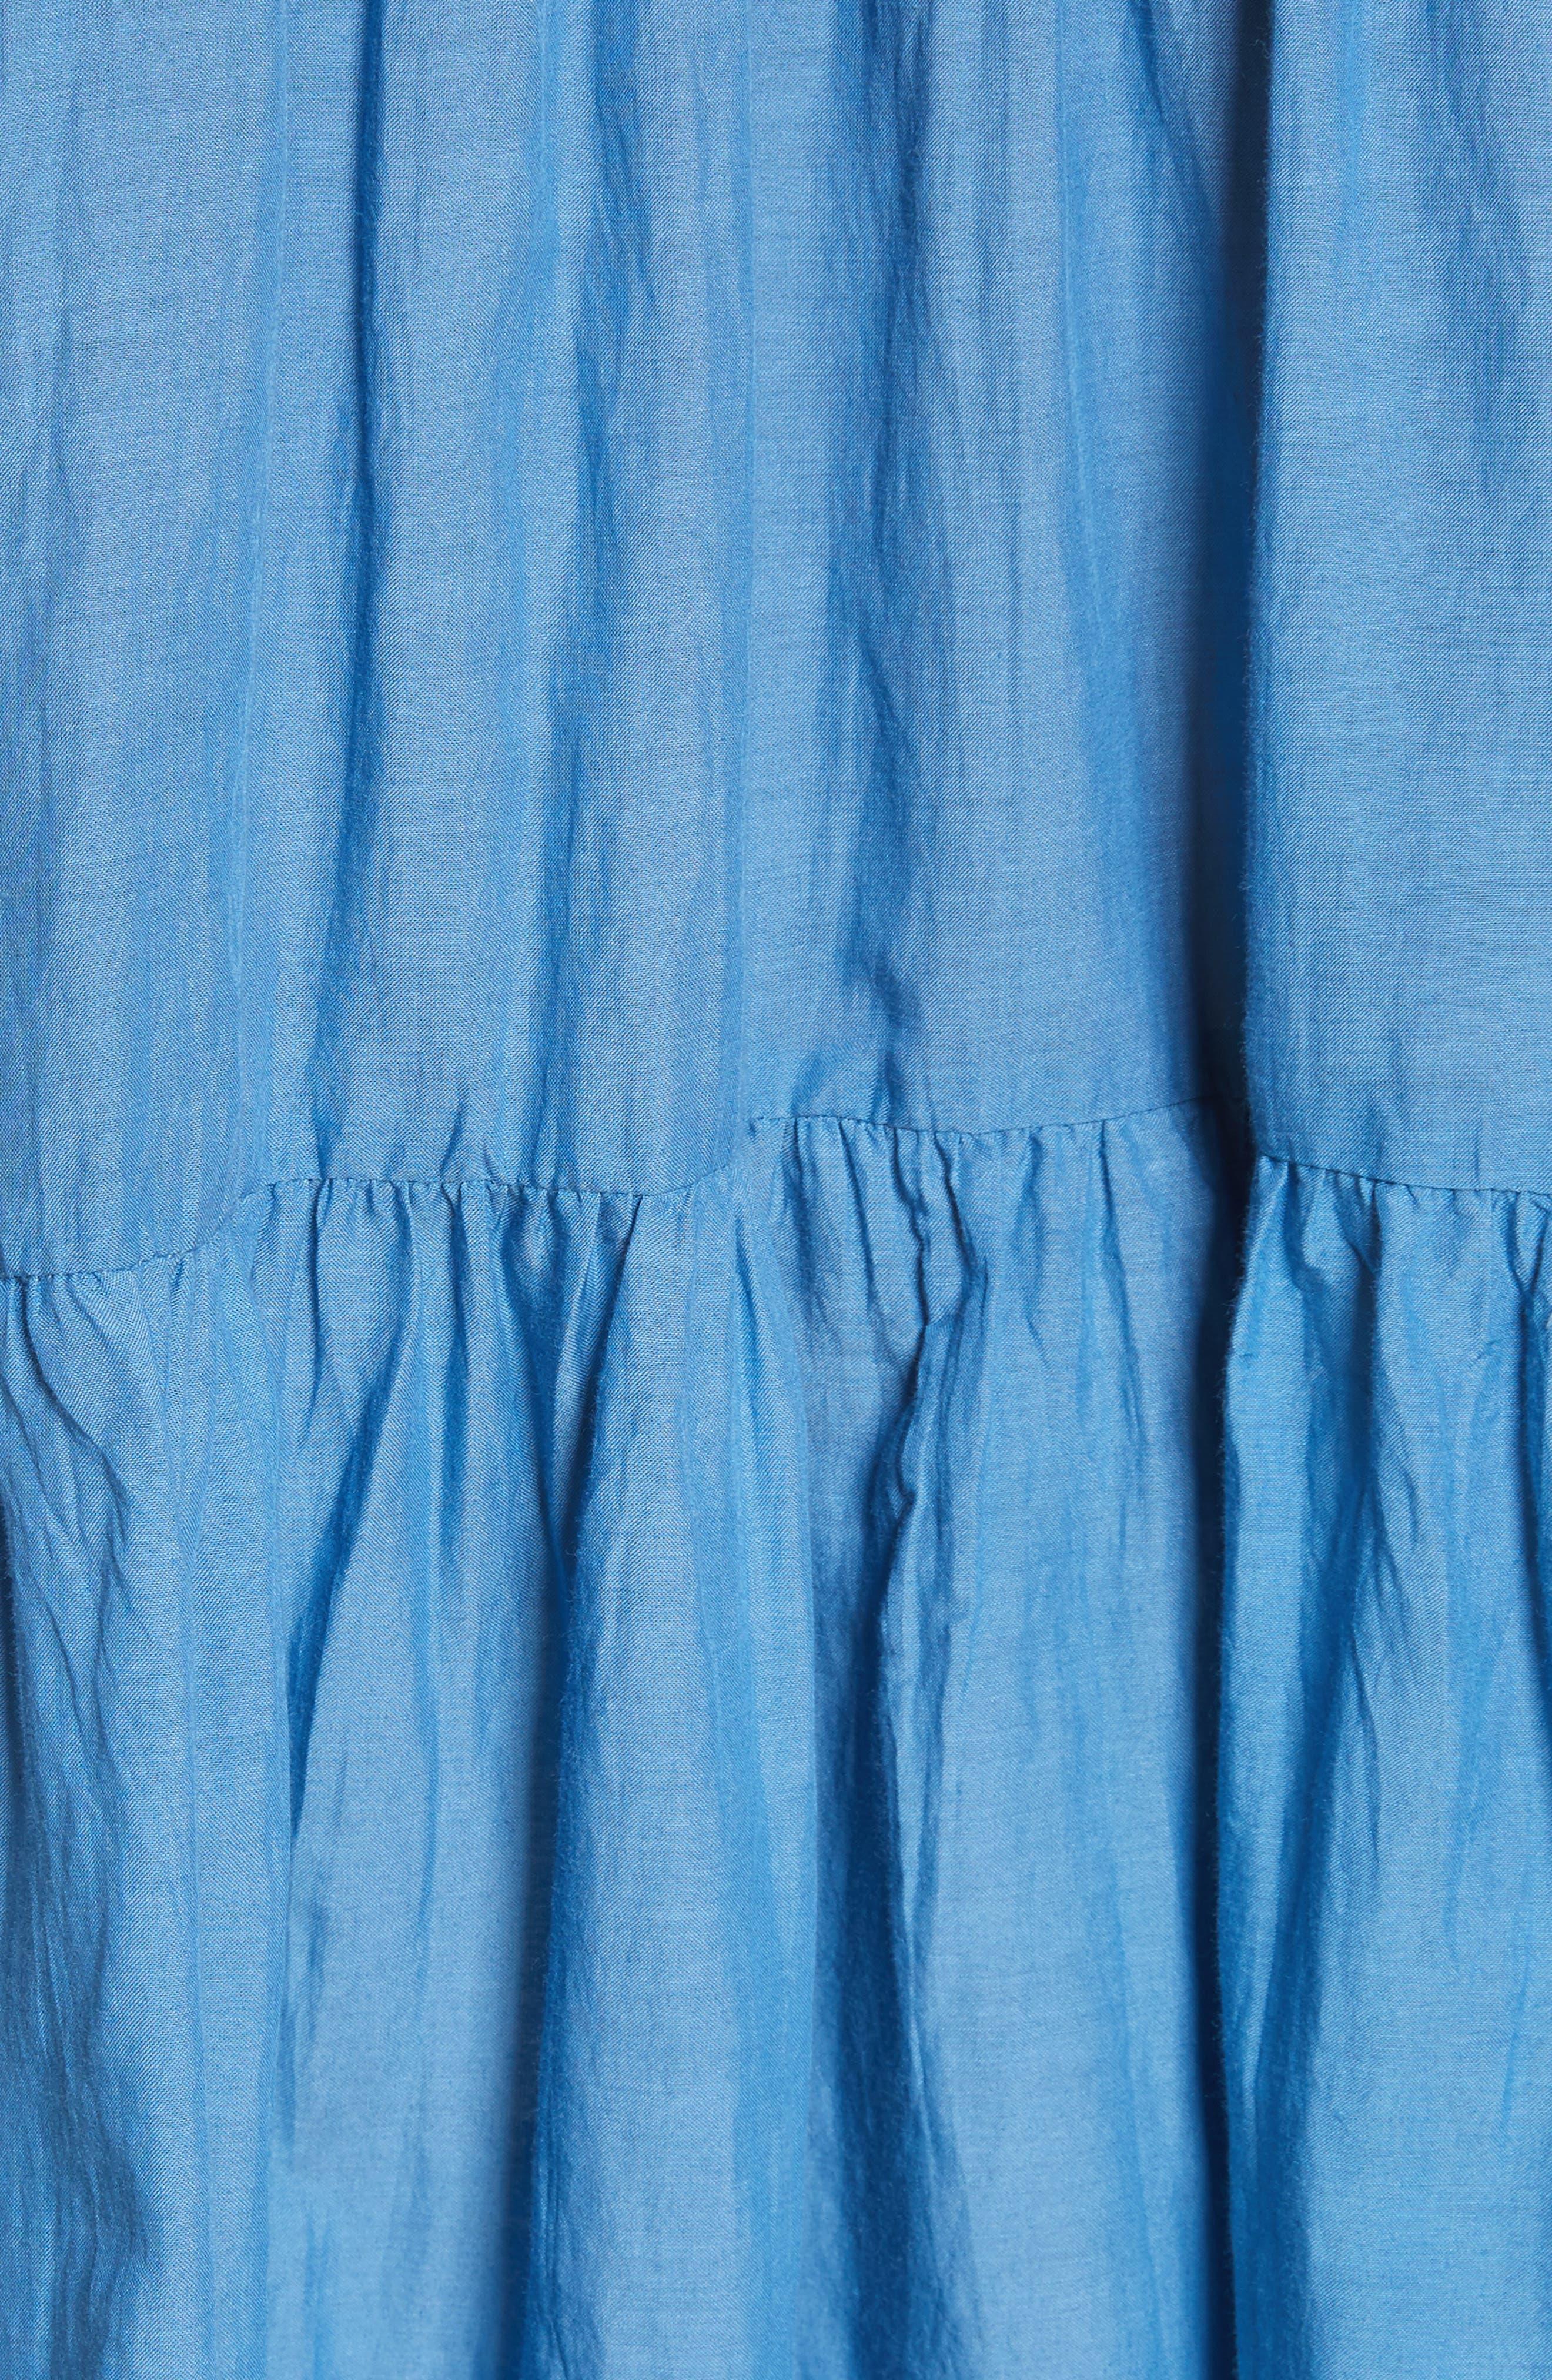 Adaline Ruffle Cotton Blouse,                             Alternate thumbnail 6, color,                             Blue